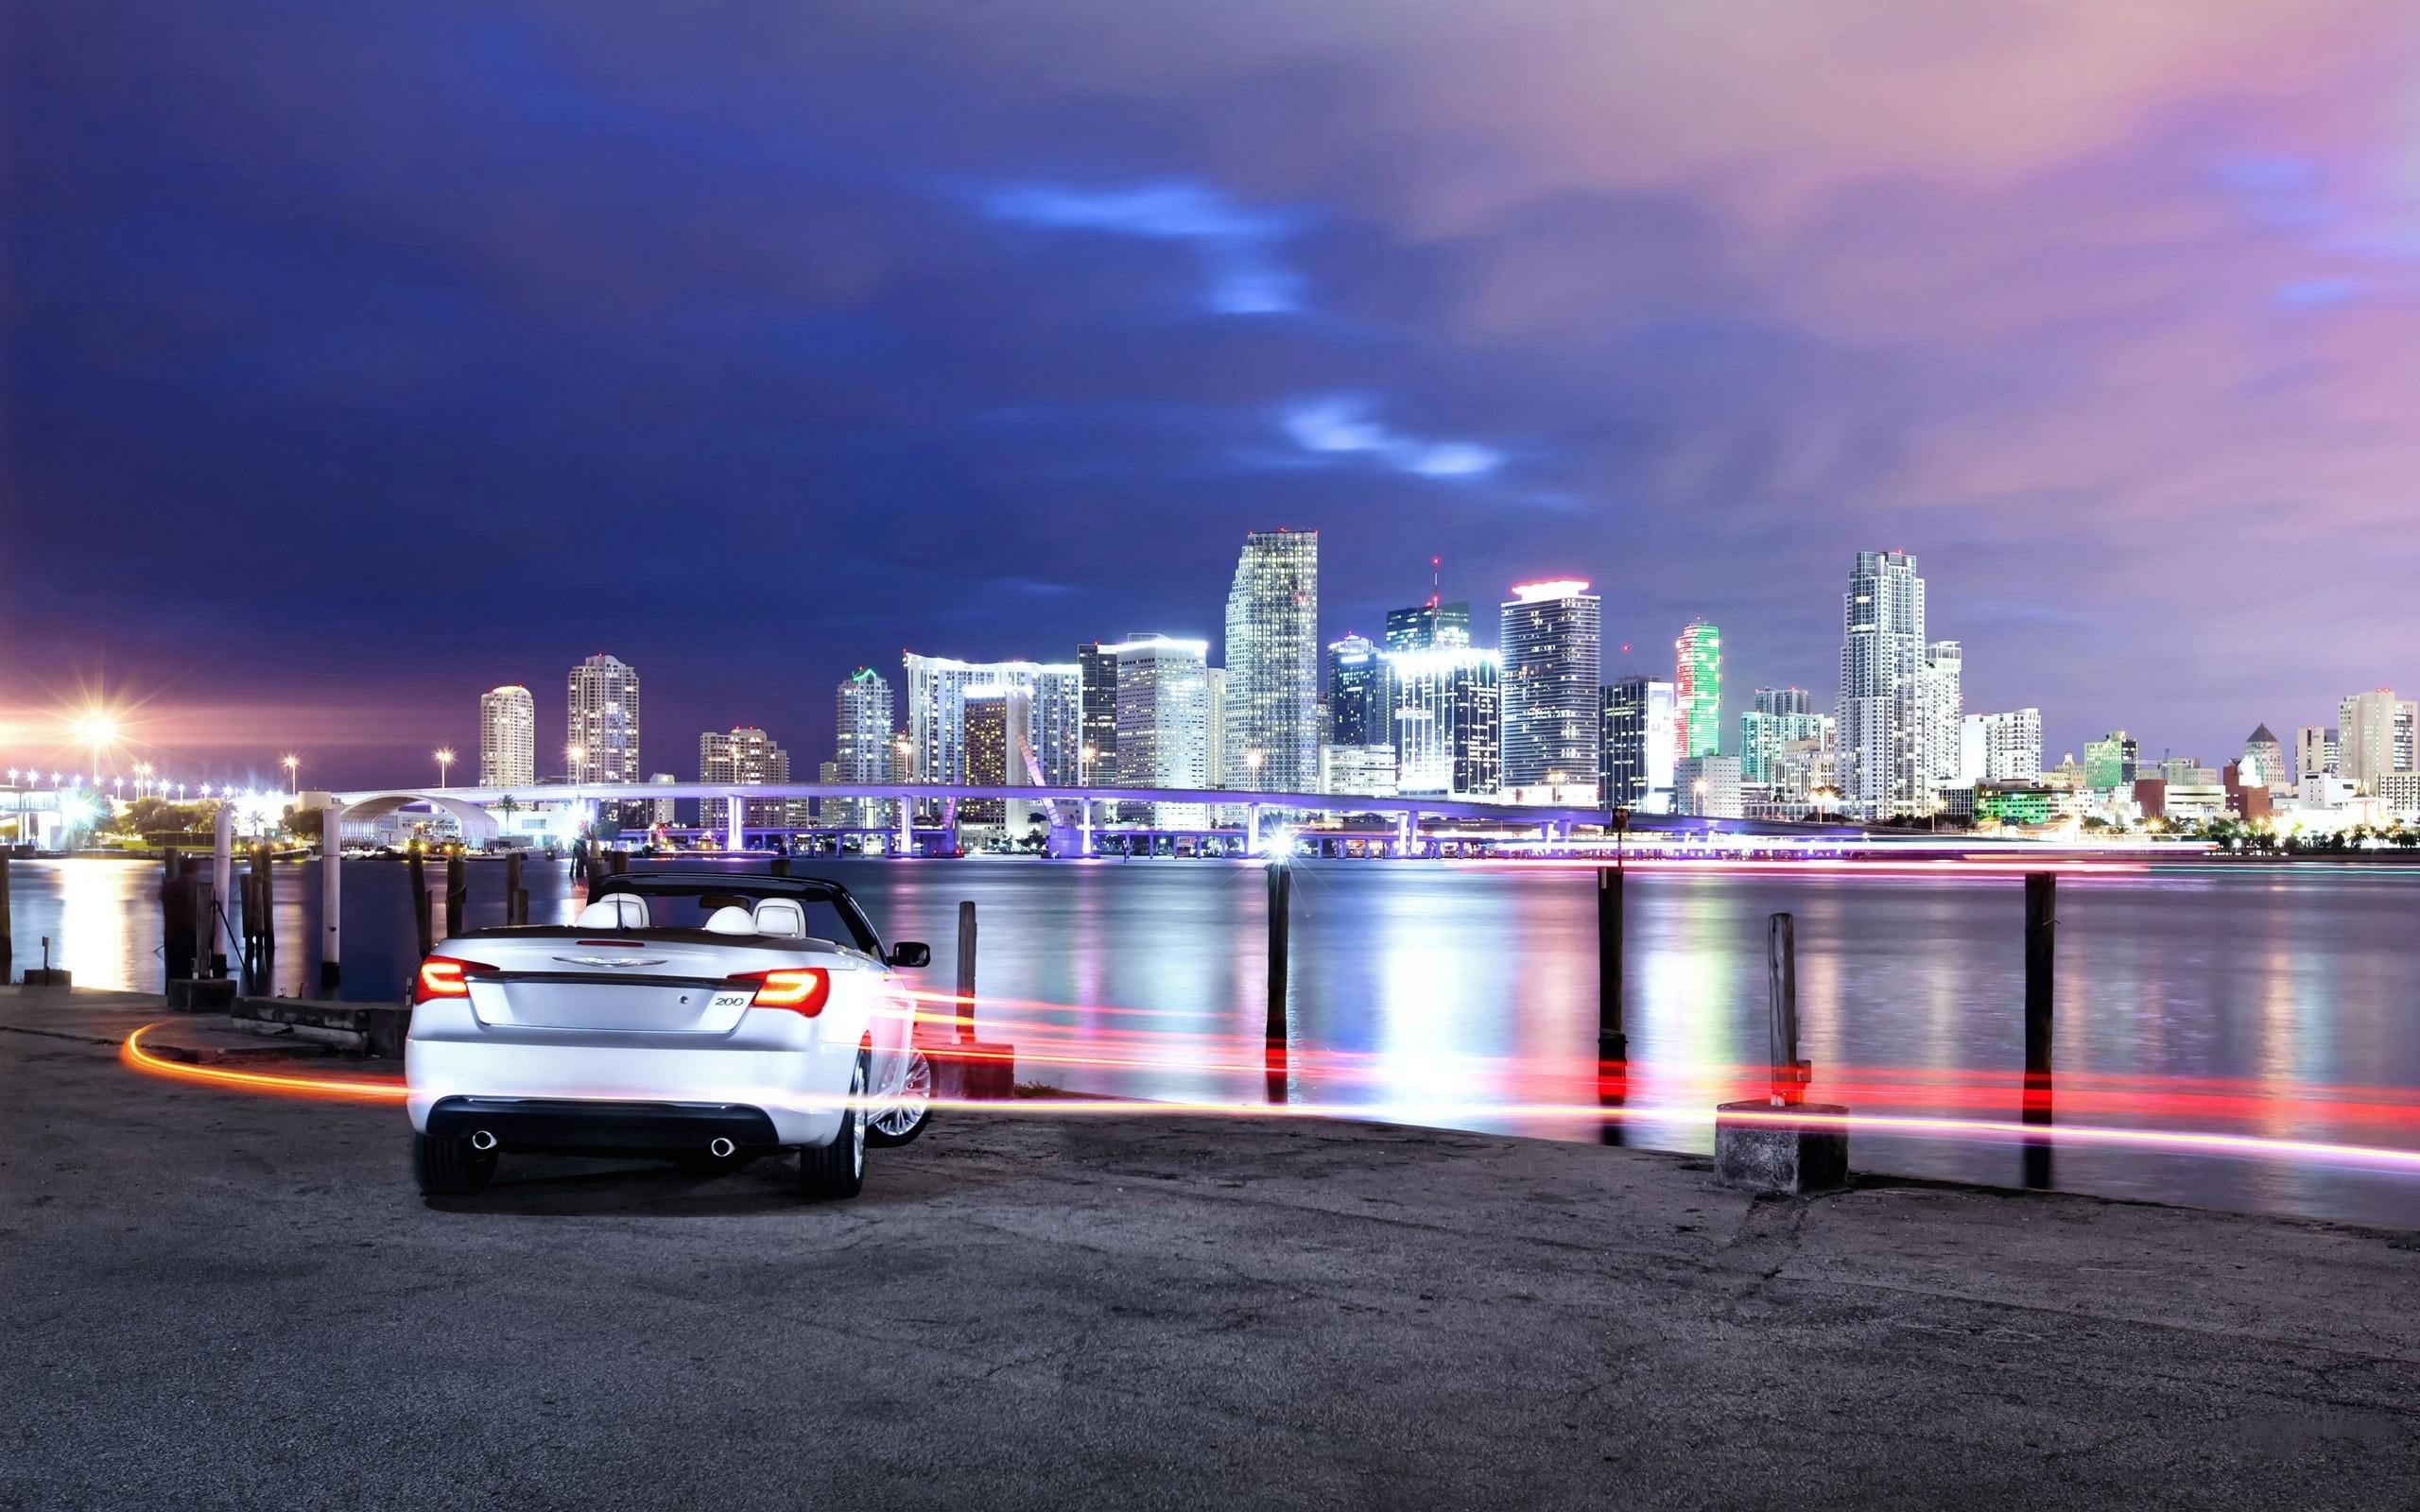 Download the Detroit City Chrysler Wallpaper Detroit City 2560x1600